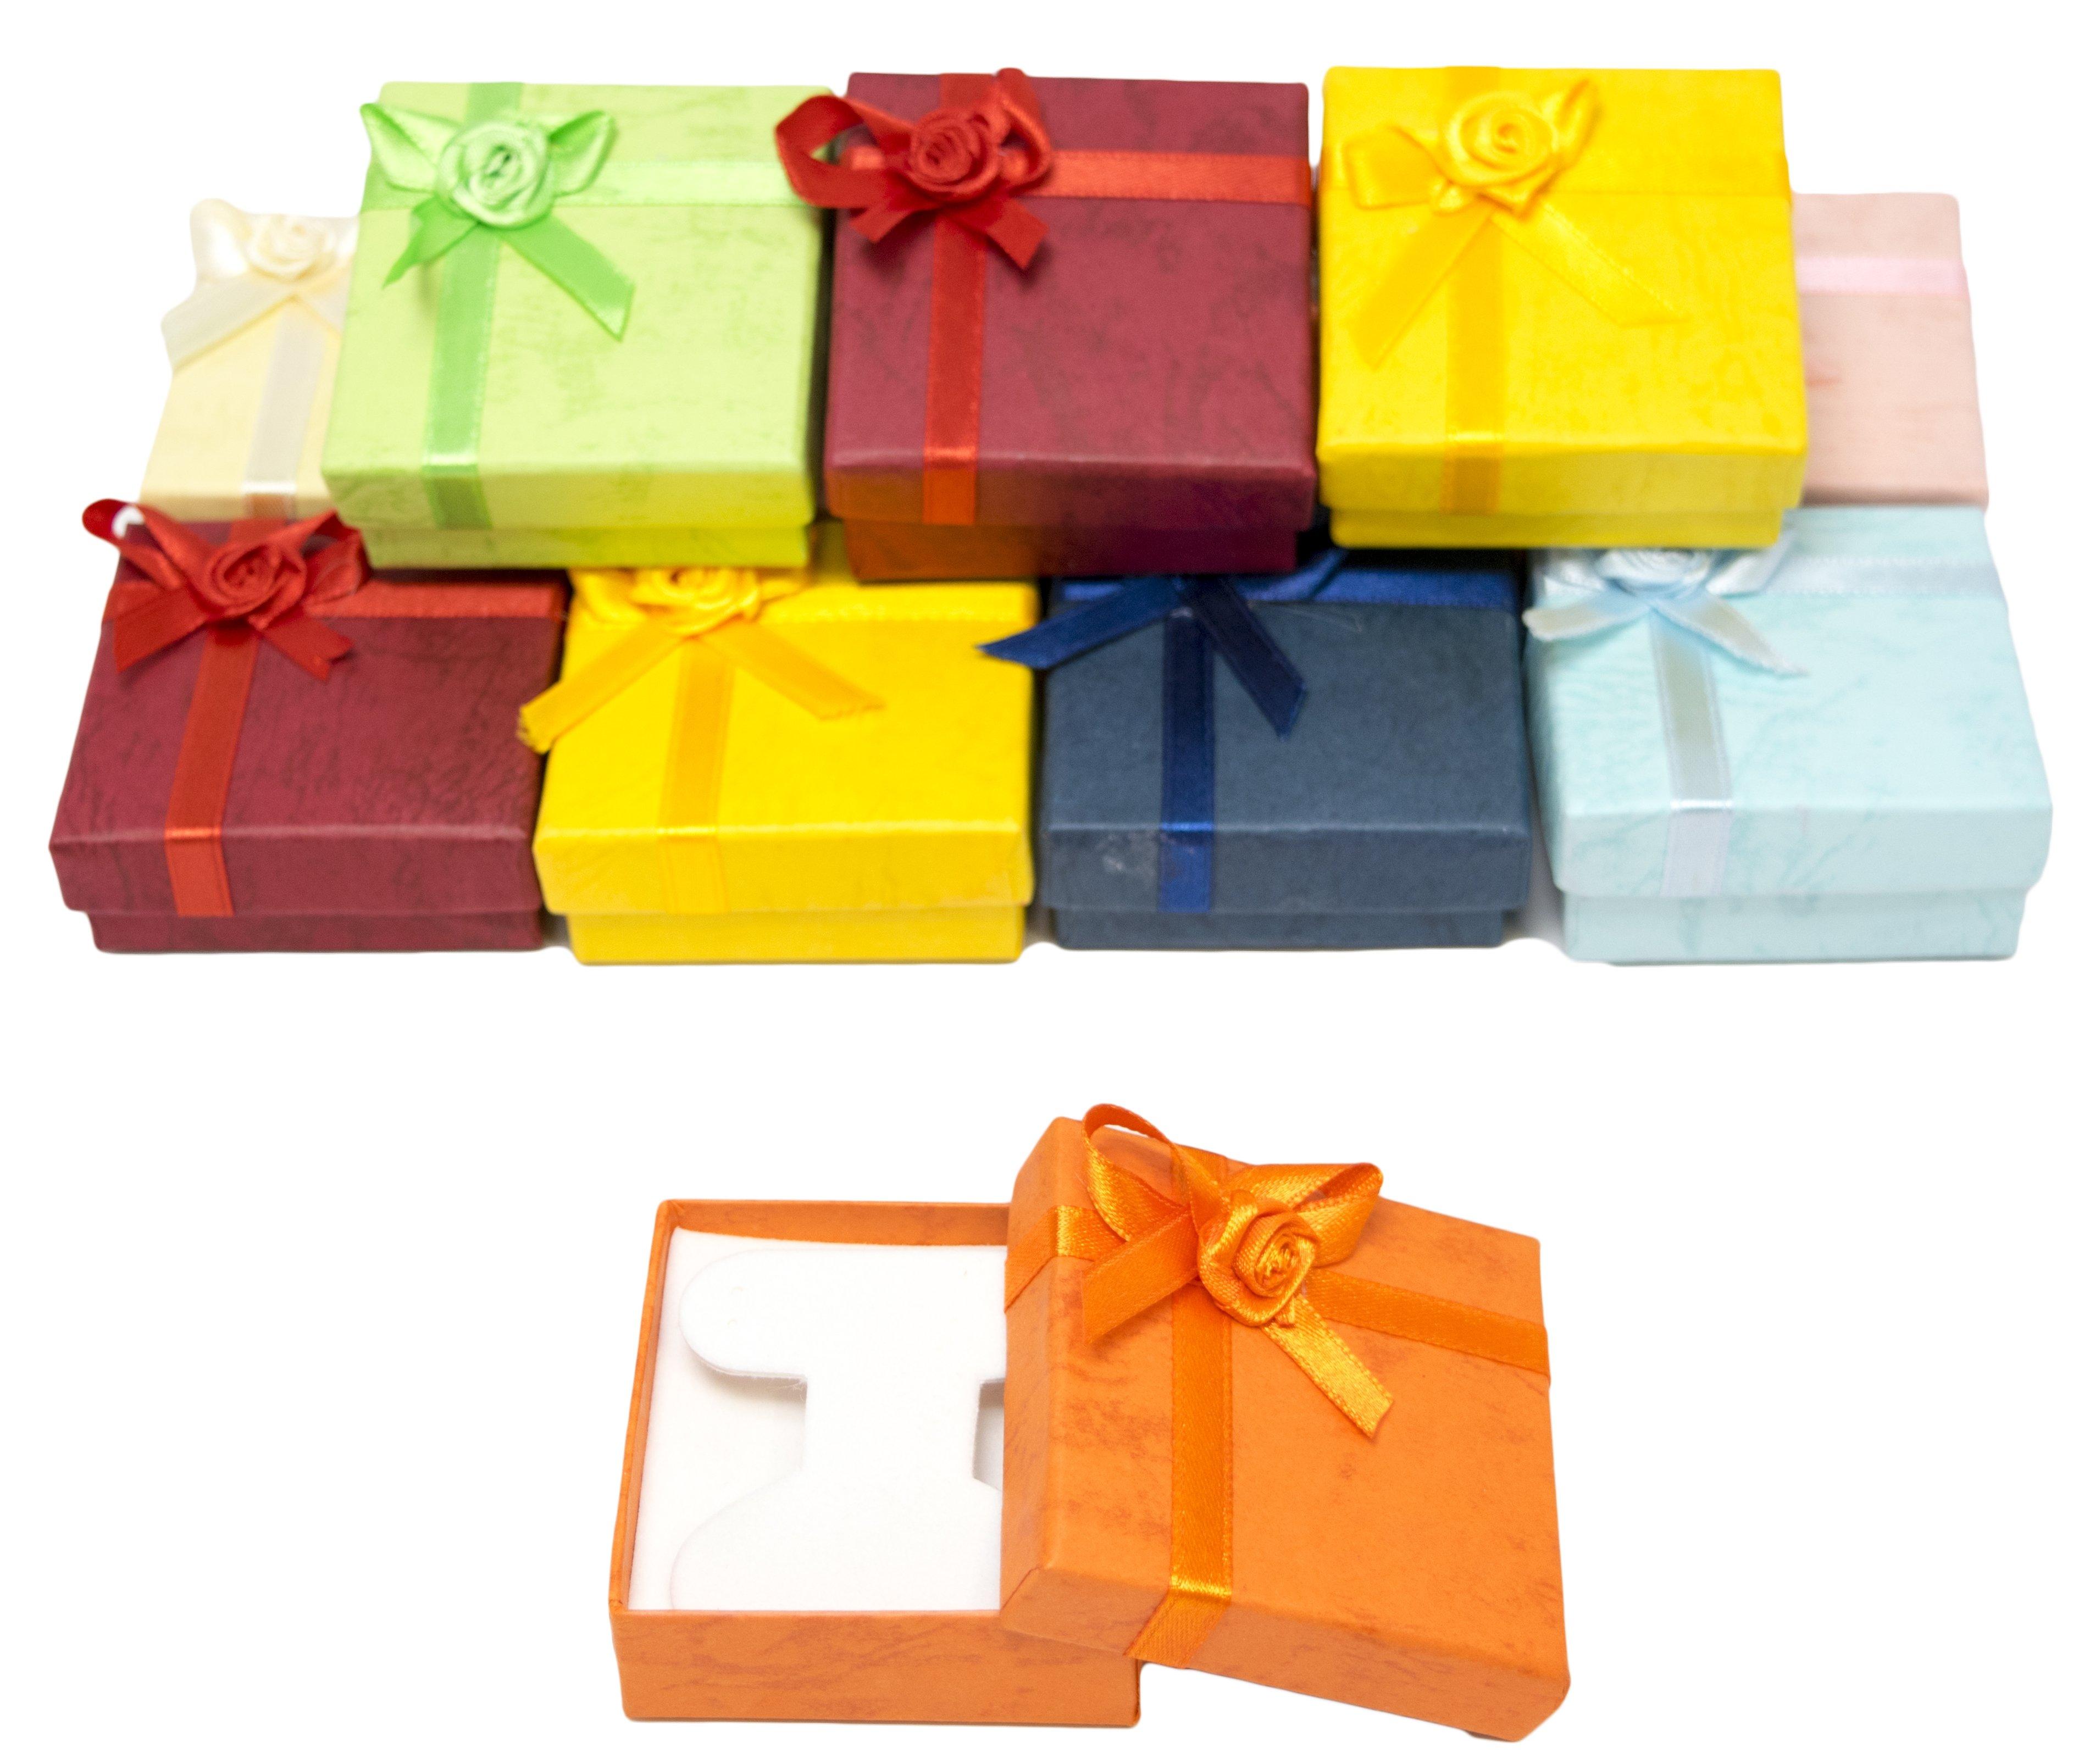 novel box cardboard jewelry gift boxes with rosebug bows. Black Bedroom Furniture Sets. Home Design Ideas